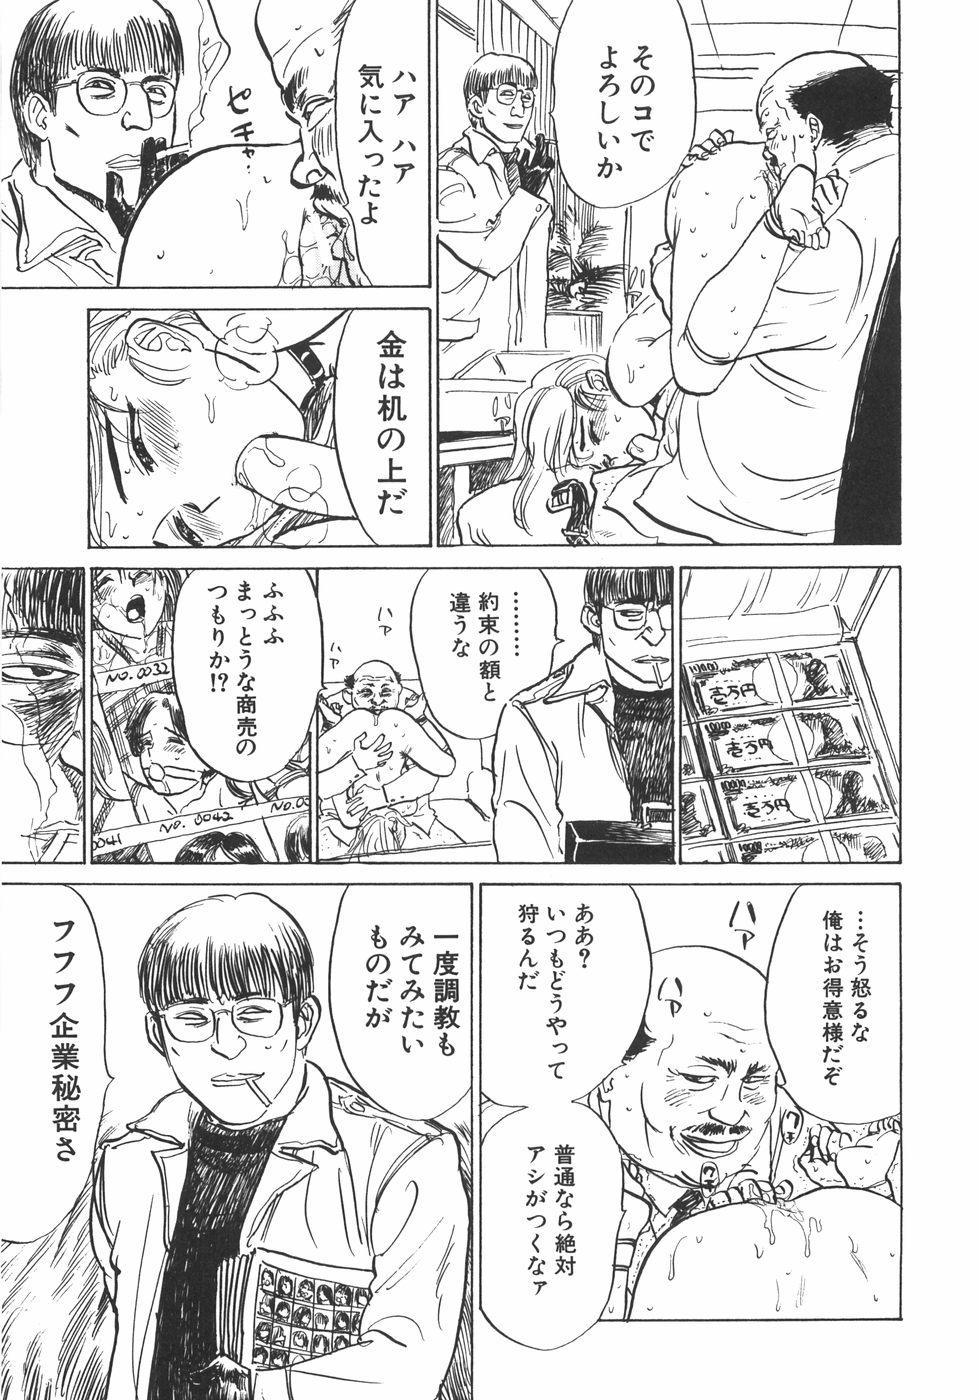 Ningyou no Yakata - The Doll House 75